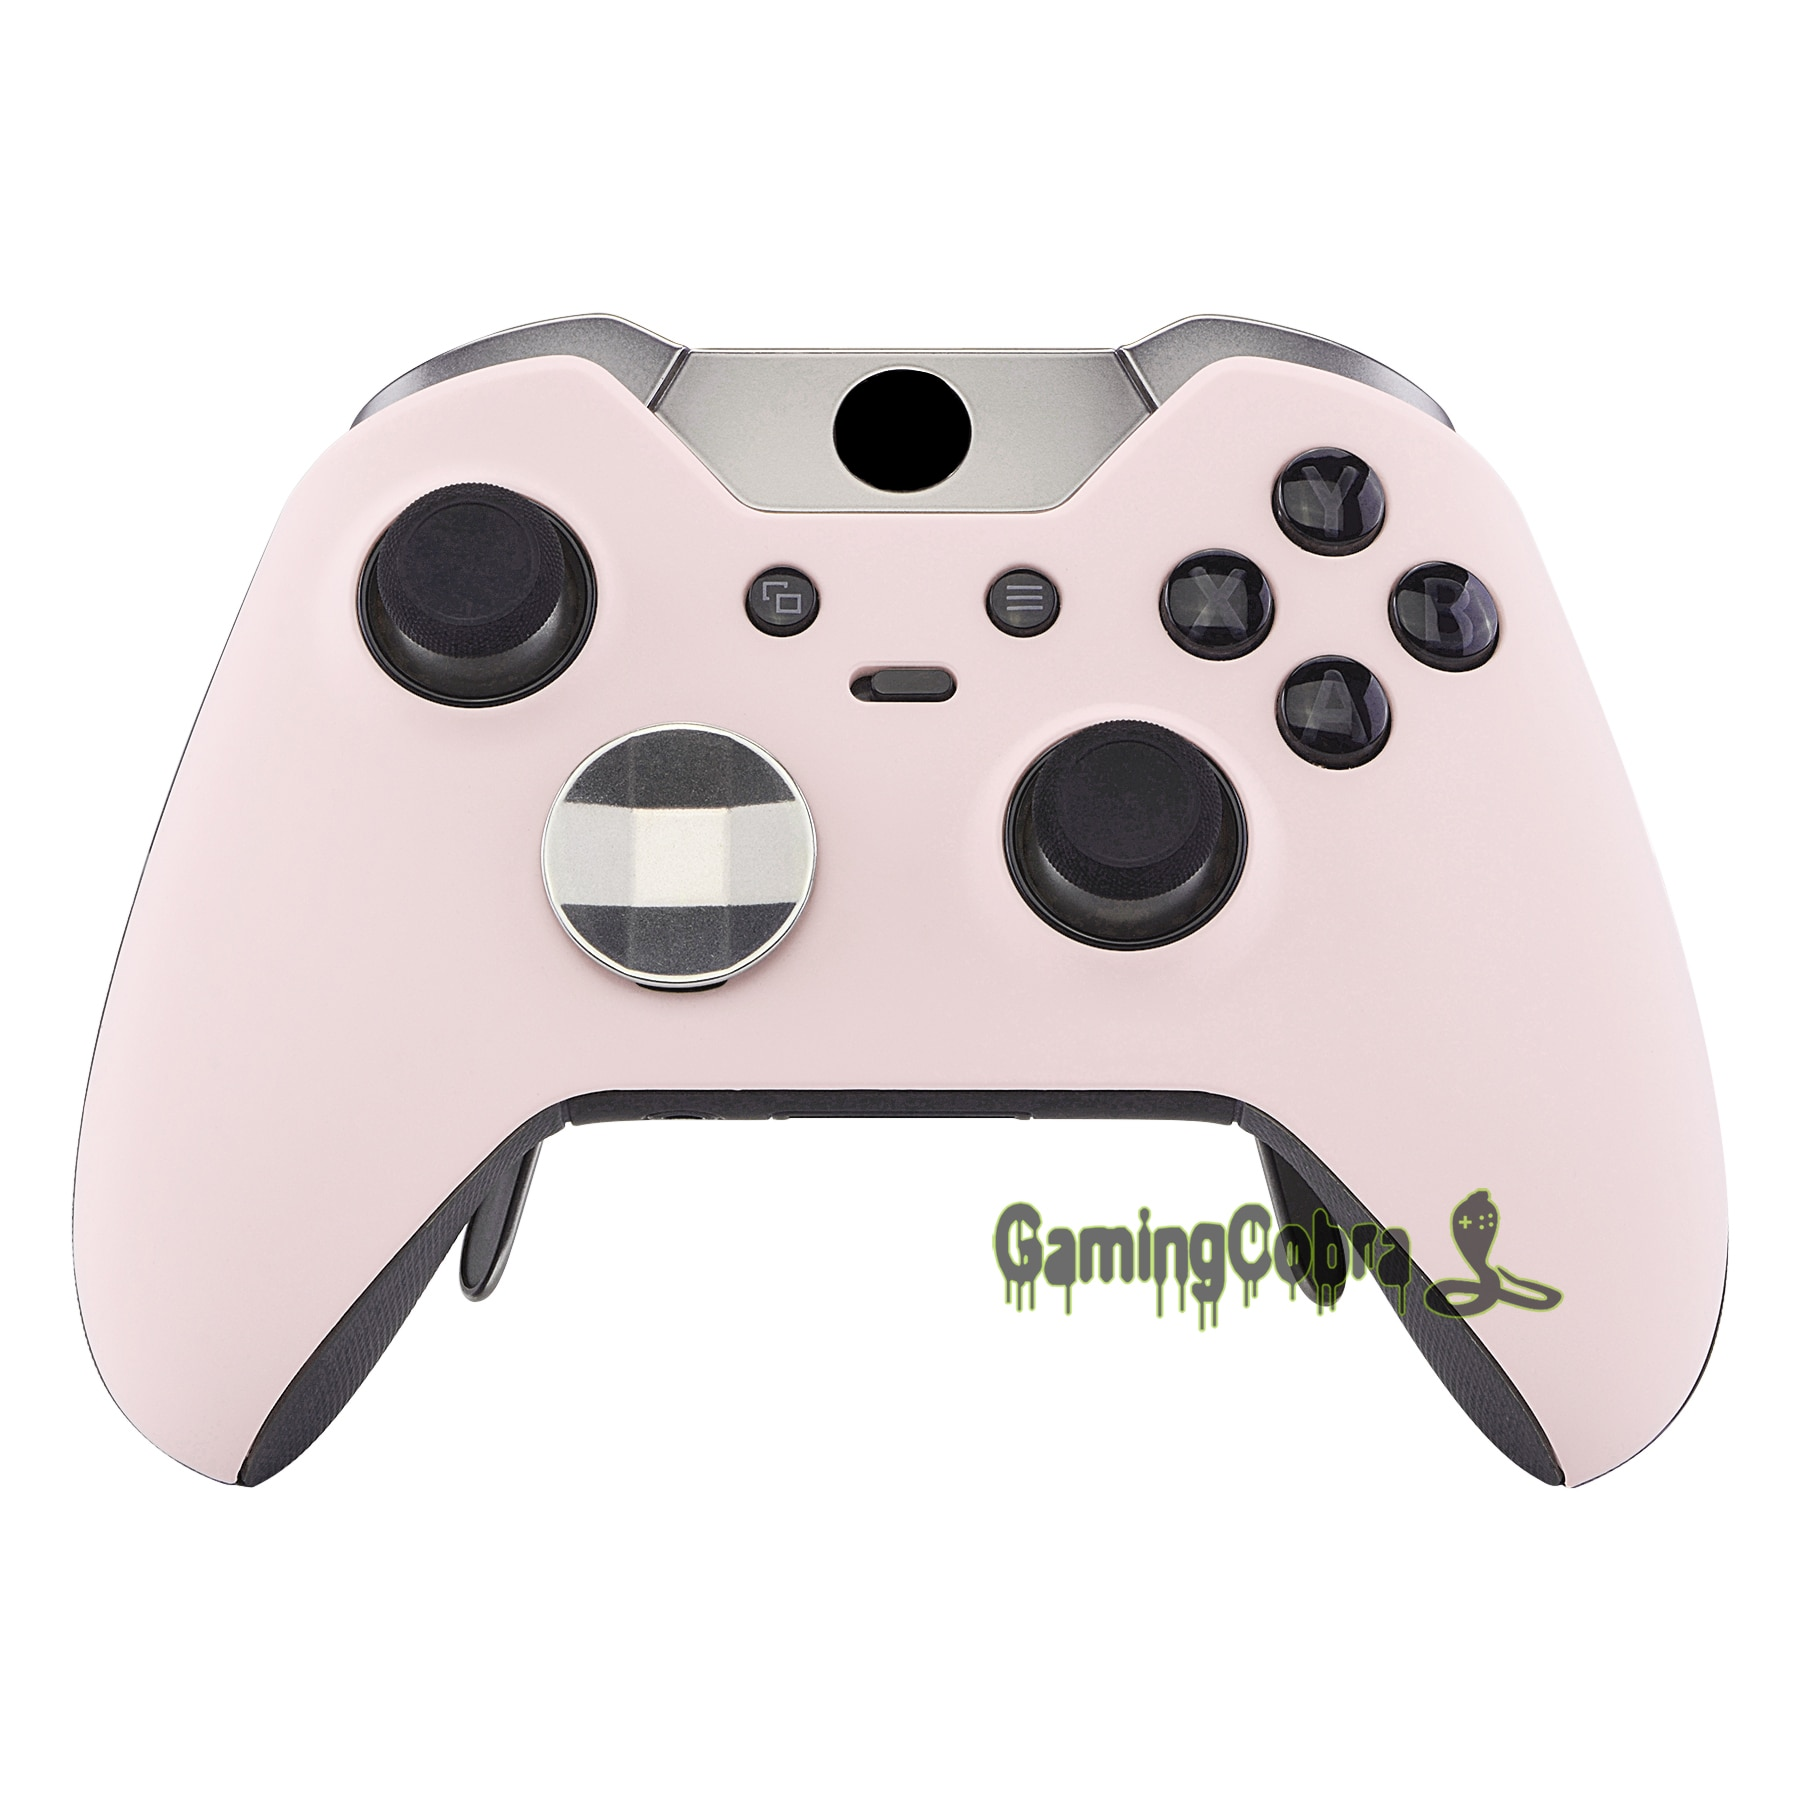 Personalizado Saruka rosa suave tacto superior carcasa frontal Kit de reemplazo para Xbox One Elite Controller modelo 1698